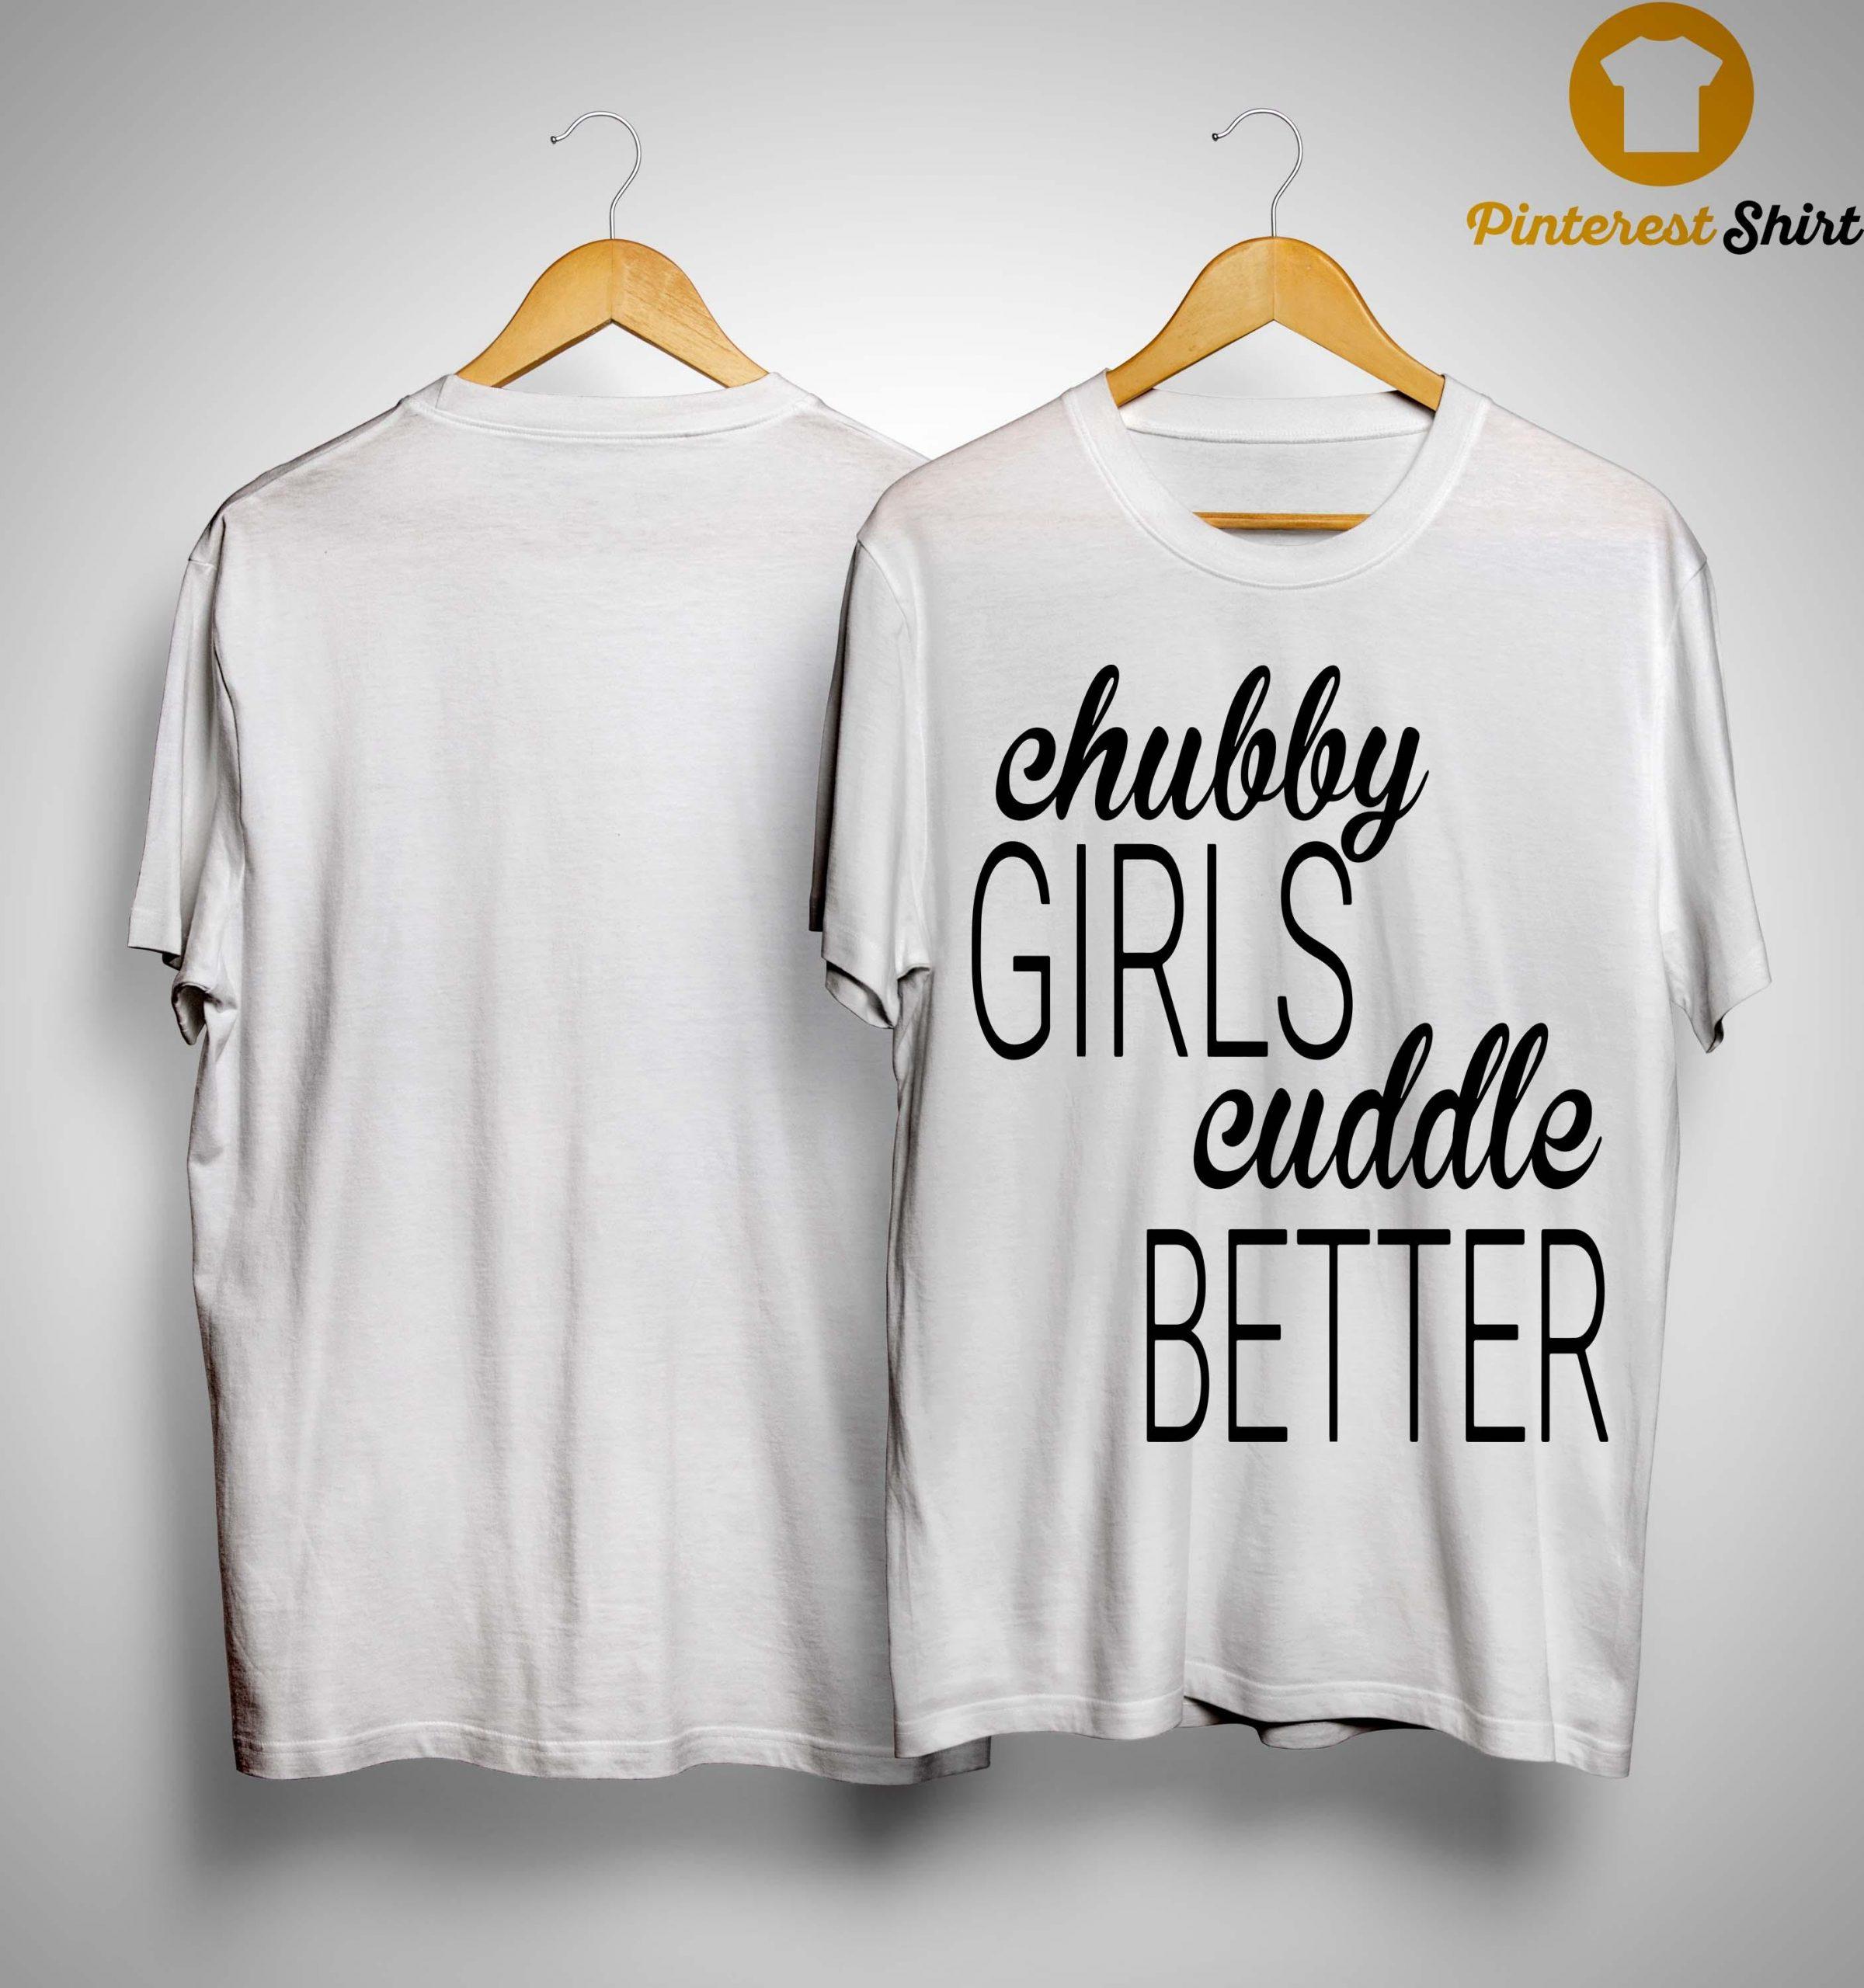 Chubby Girls Cuddle Better Shirt